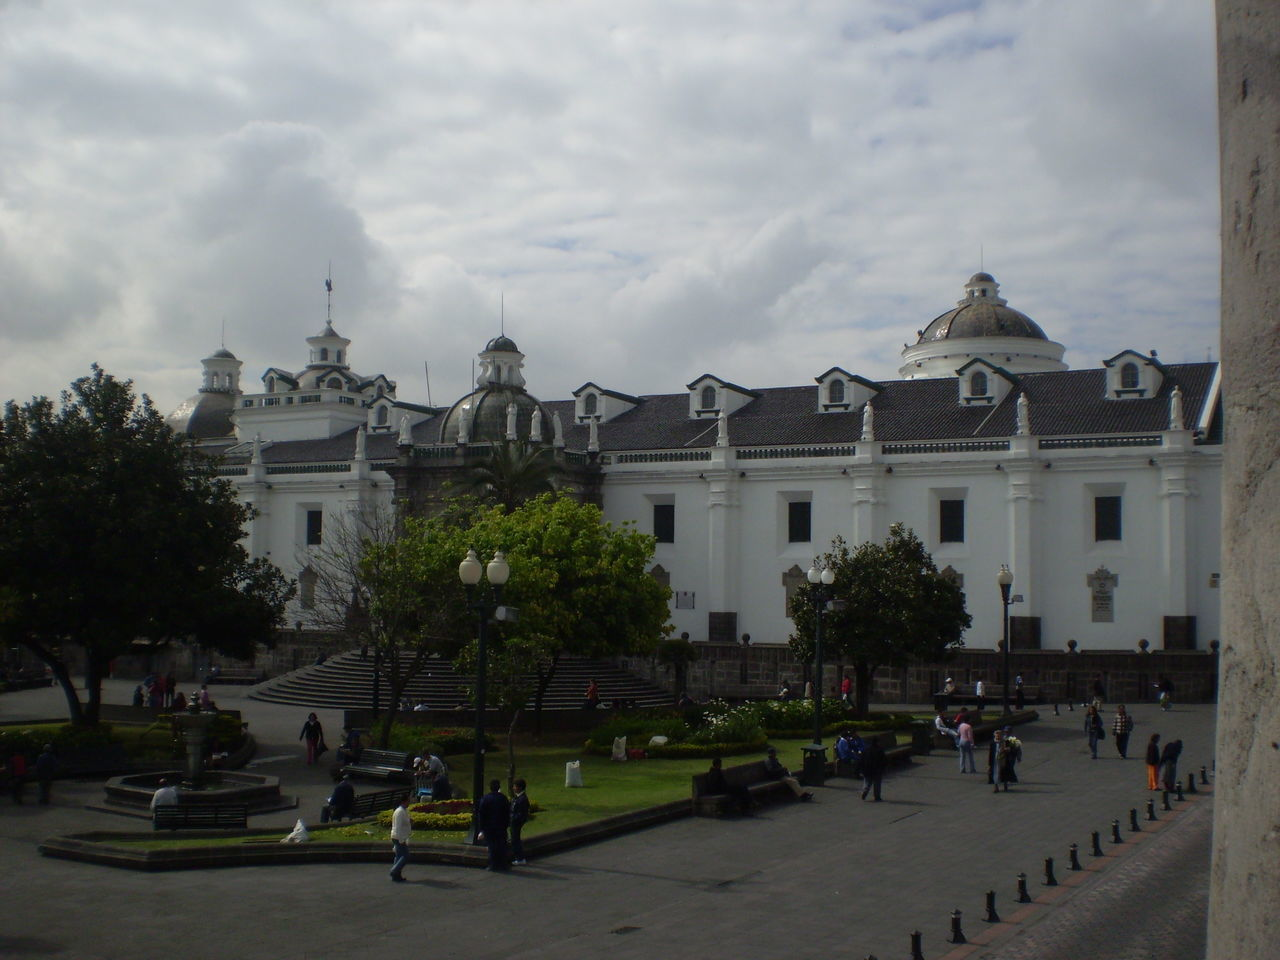 #arquitecture #City #clouds  #ecuador #Quito #TheTourist #Zocalo Historic